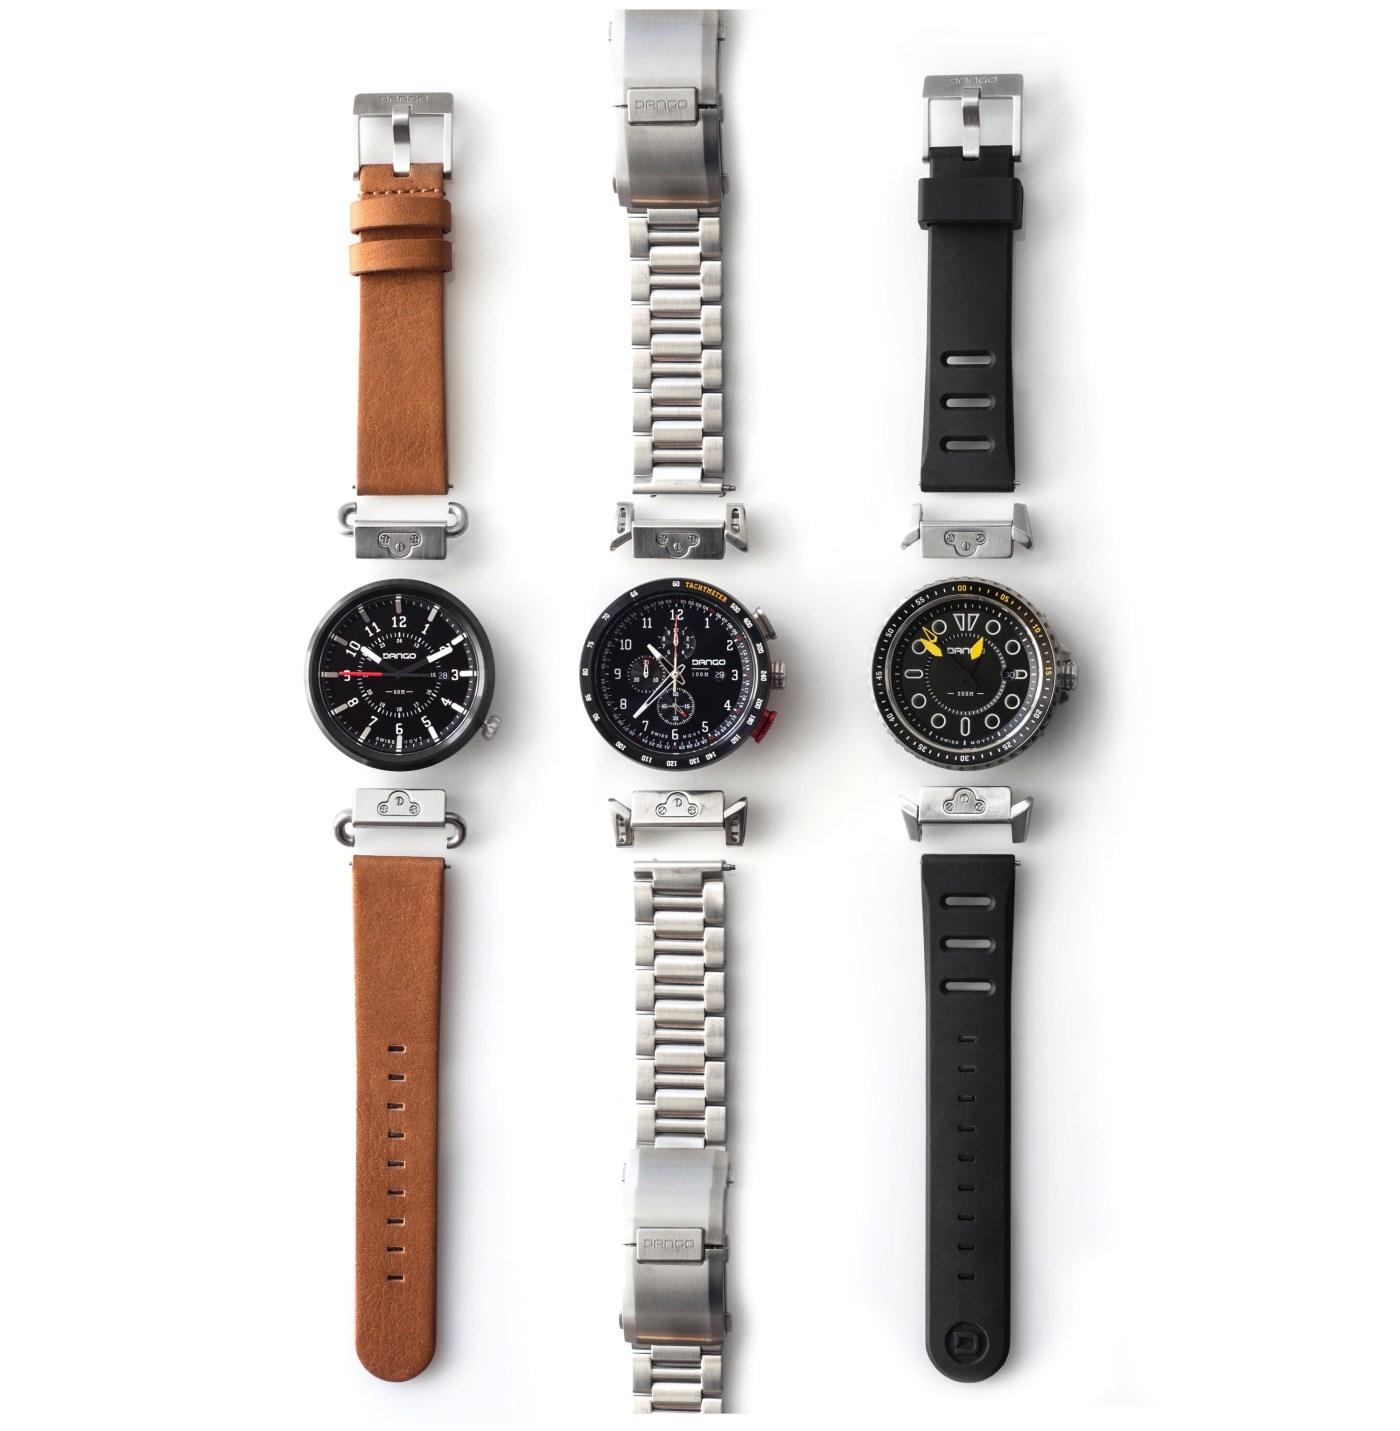 Deconstructed Dango modular watches three models